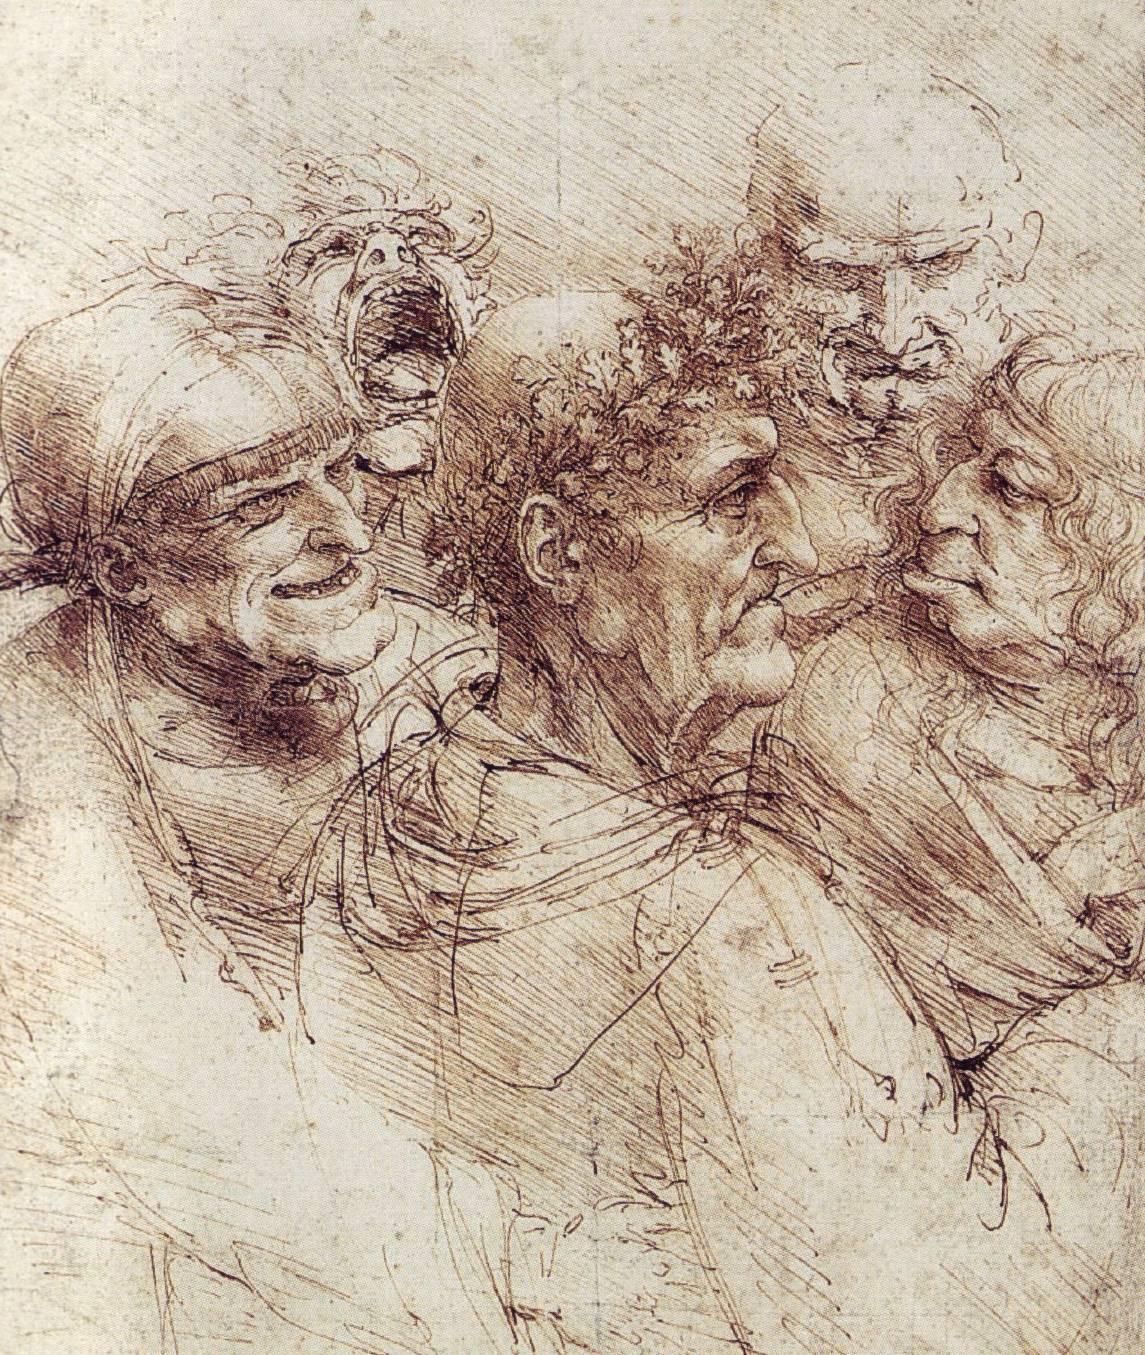 1145x1355 The Drawings Of Leonardo Da Vinci